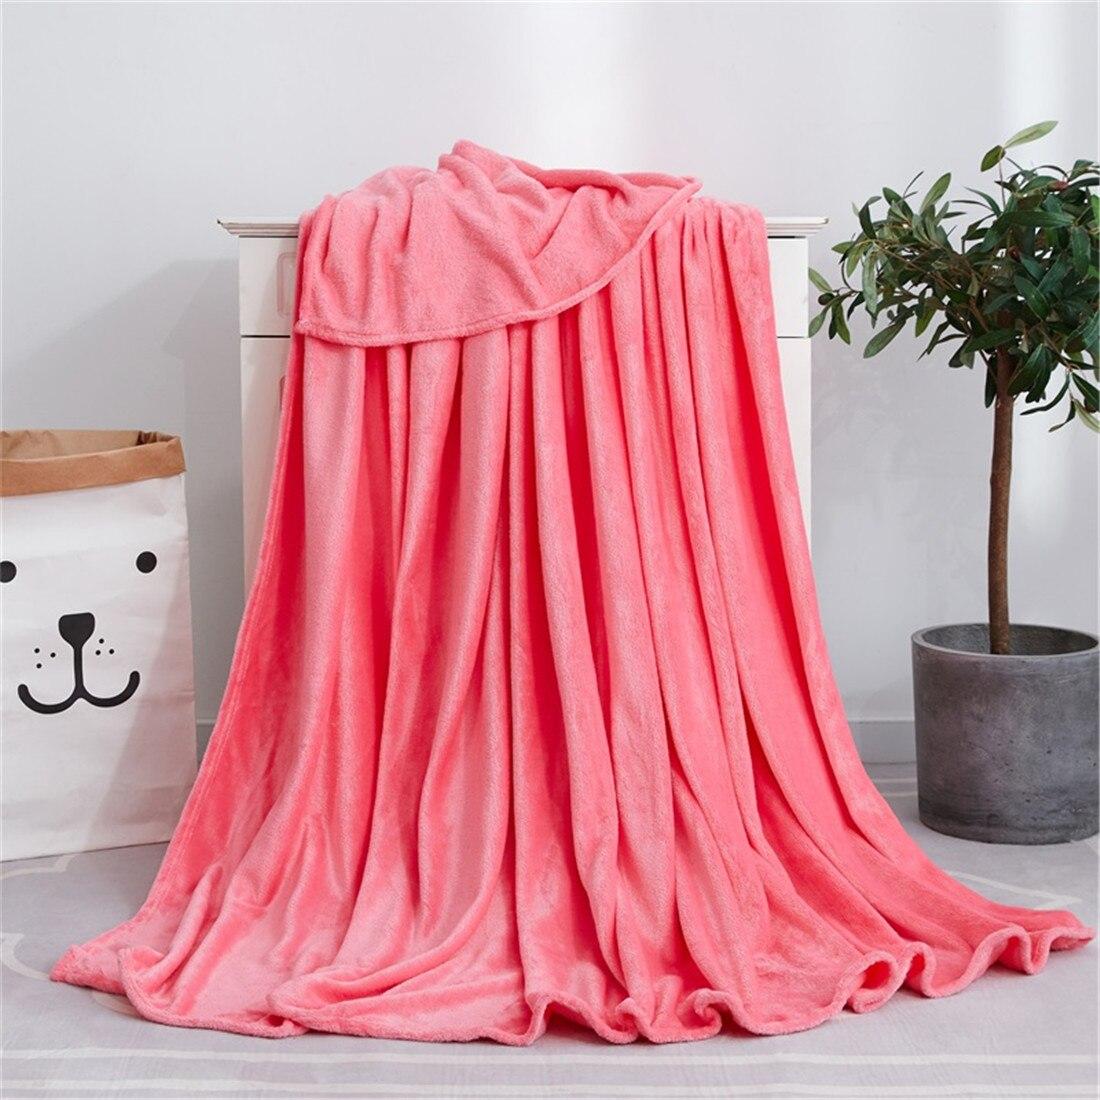 Soft Warm Coral Fleece Blanket Winter Sheet Bedspread Sofa Throw 220Gsm 6 Size Light Thin Mechanical Wash Flannel Blankets